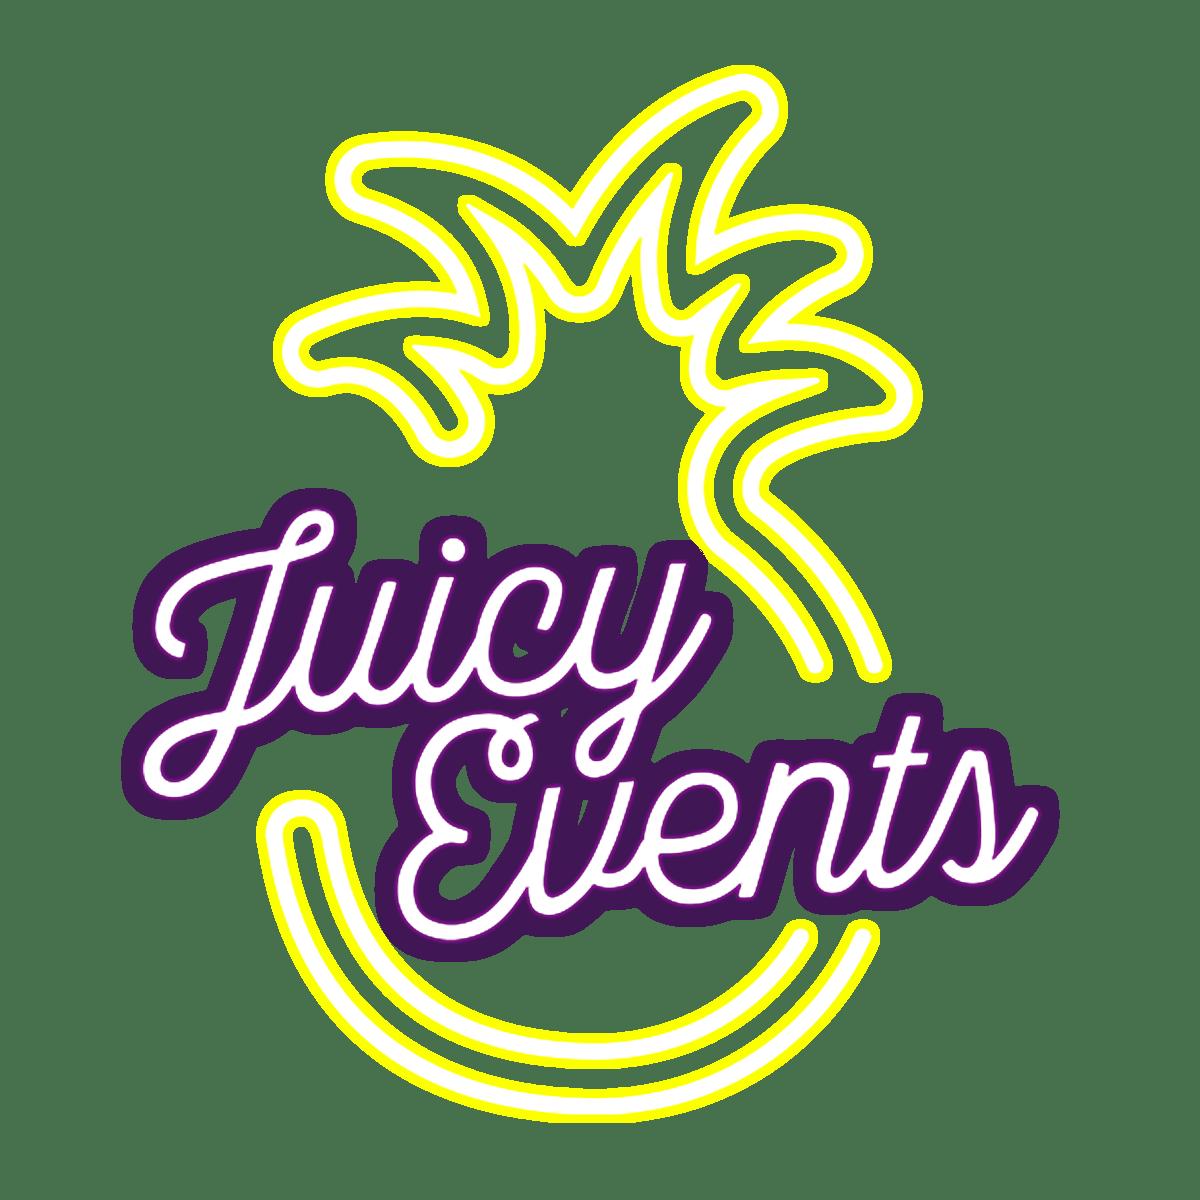 Juicy Events 3